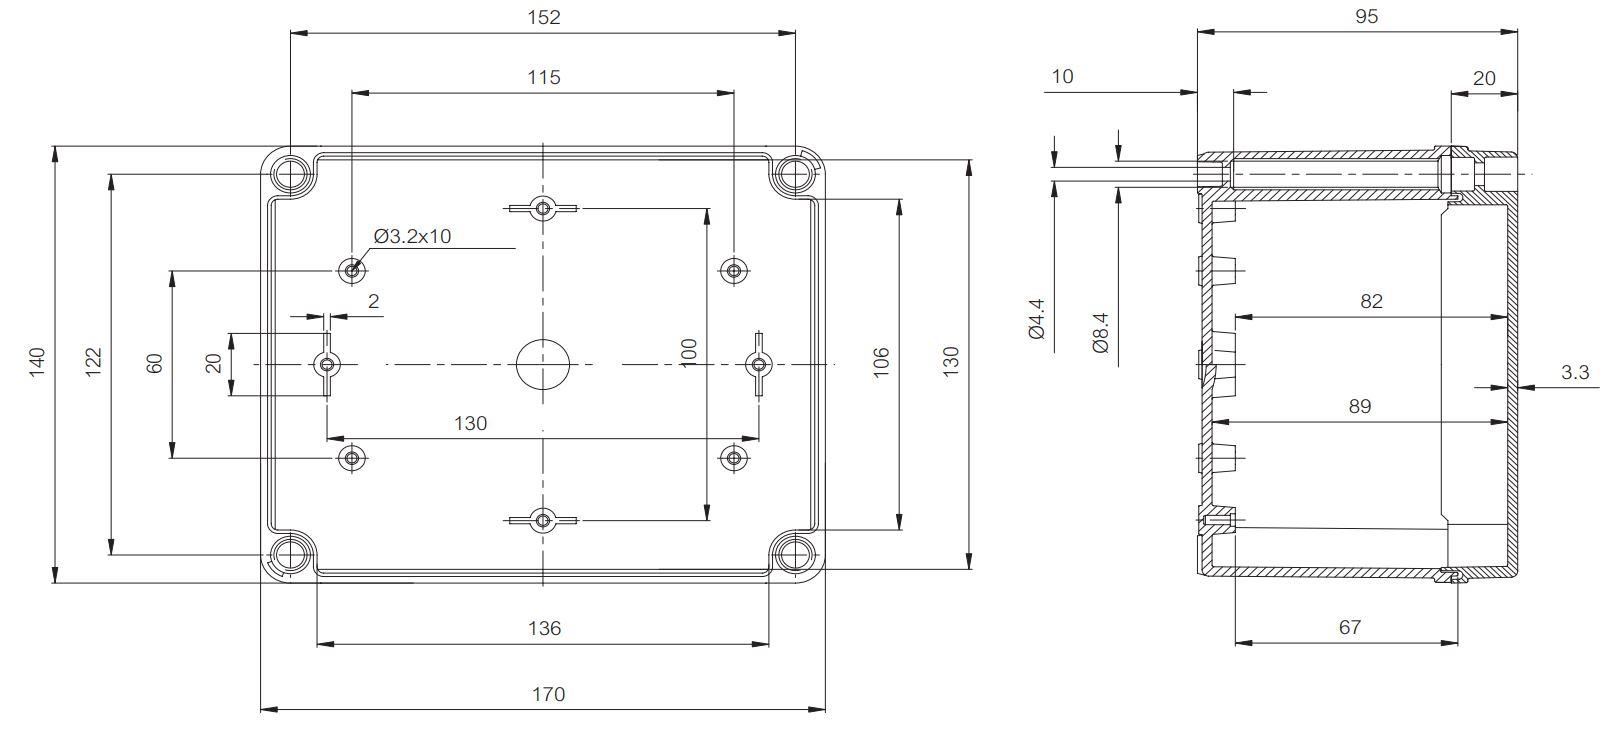 Bmv 700 Series Victron Energy Rs232 Pinout Diagram Http Wwwcamerahackercom Forums 700h Shunt Box